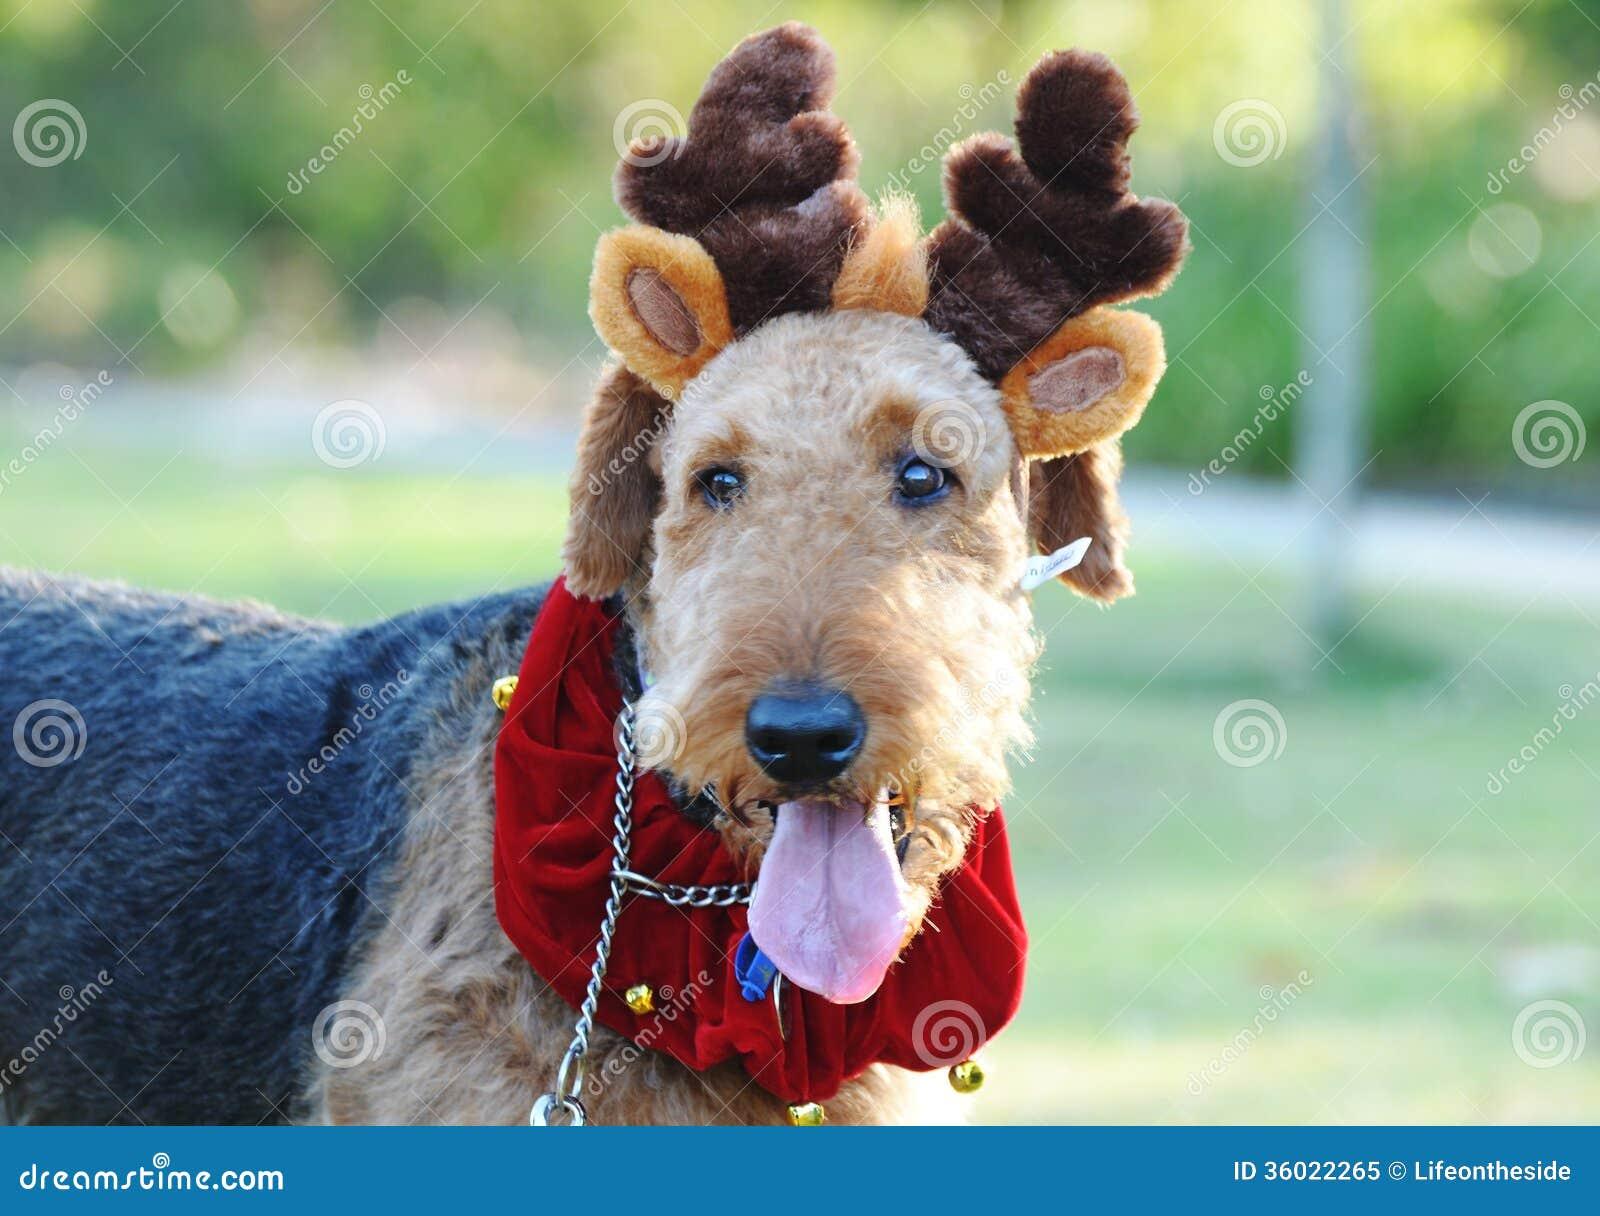 Large fluffy dog christmas costume reindeer antler royalty free stock